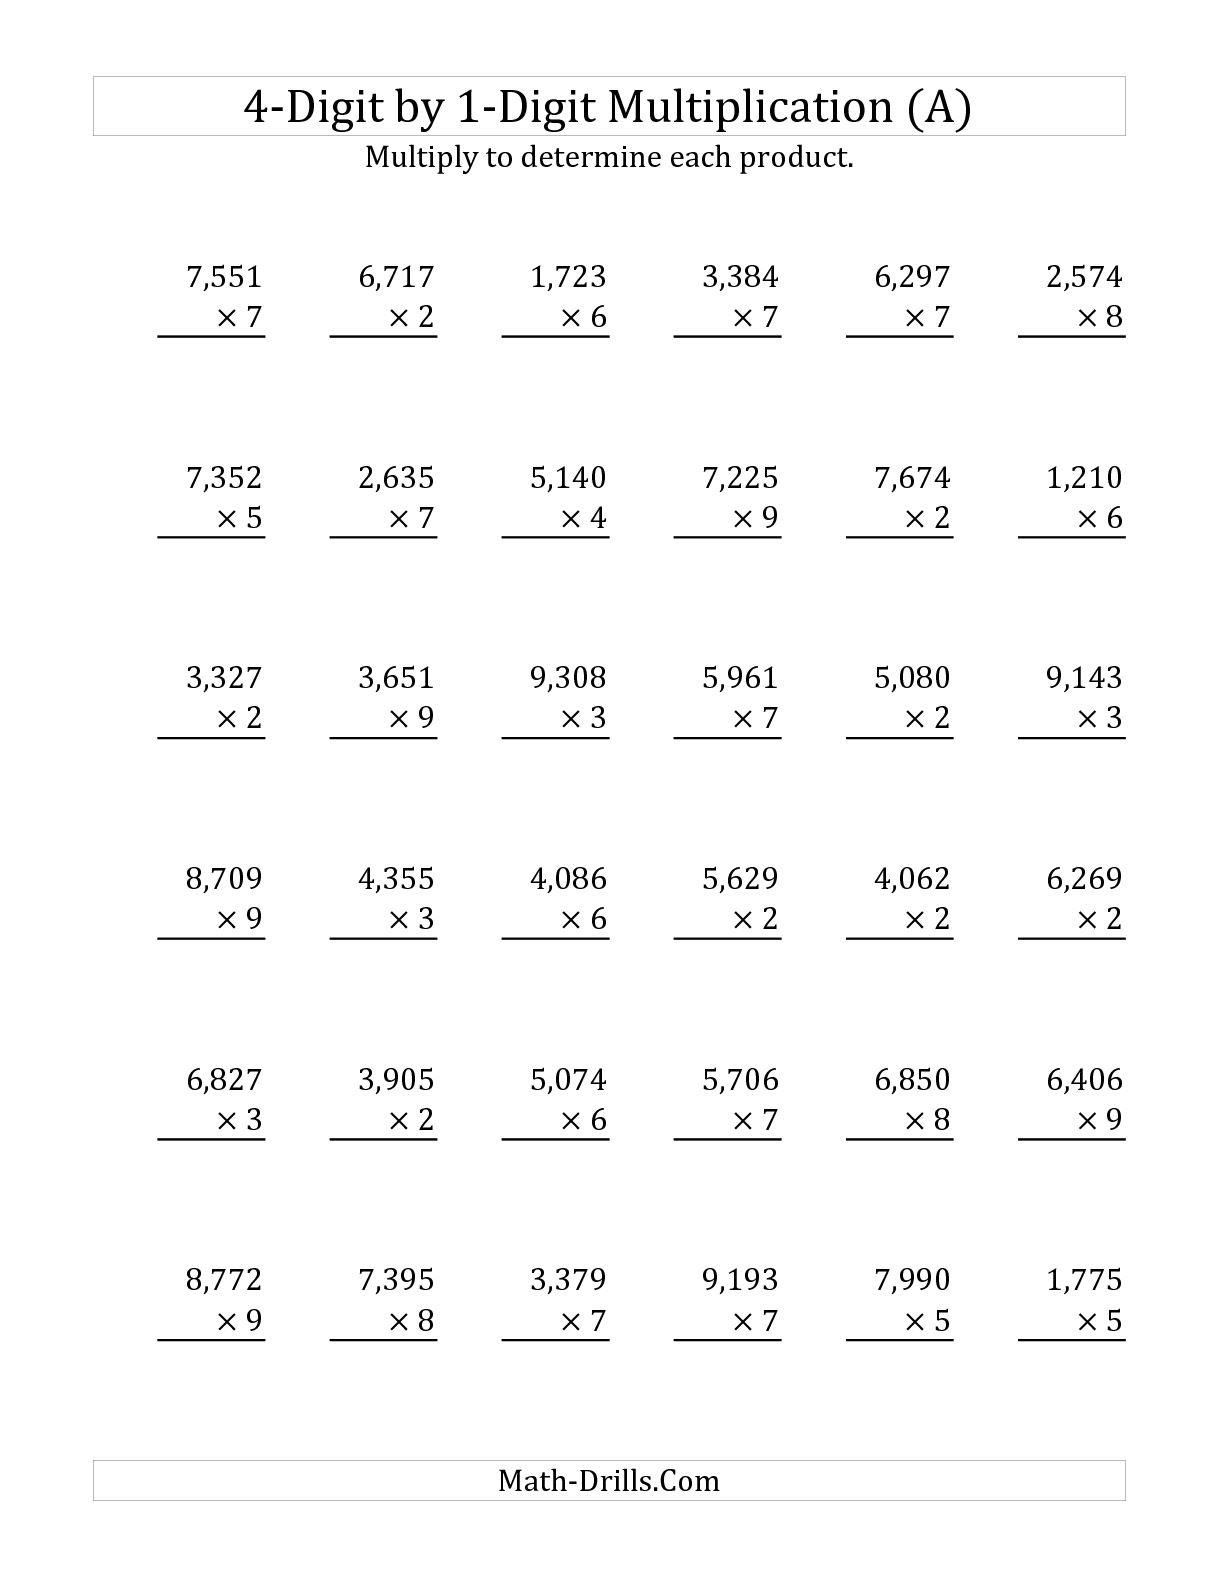 61 PDF MULTIPLICATION WORKSHEETS 1 DIGIT PRINTABLE ...